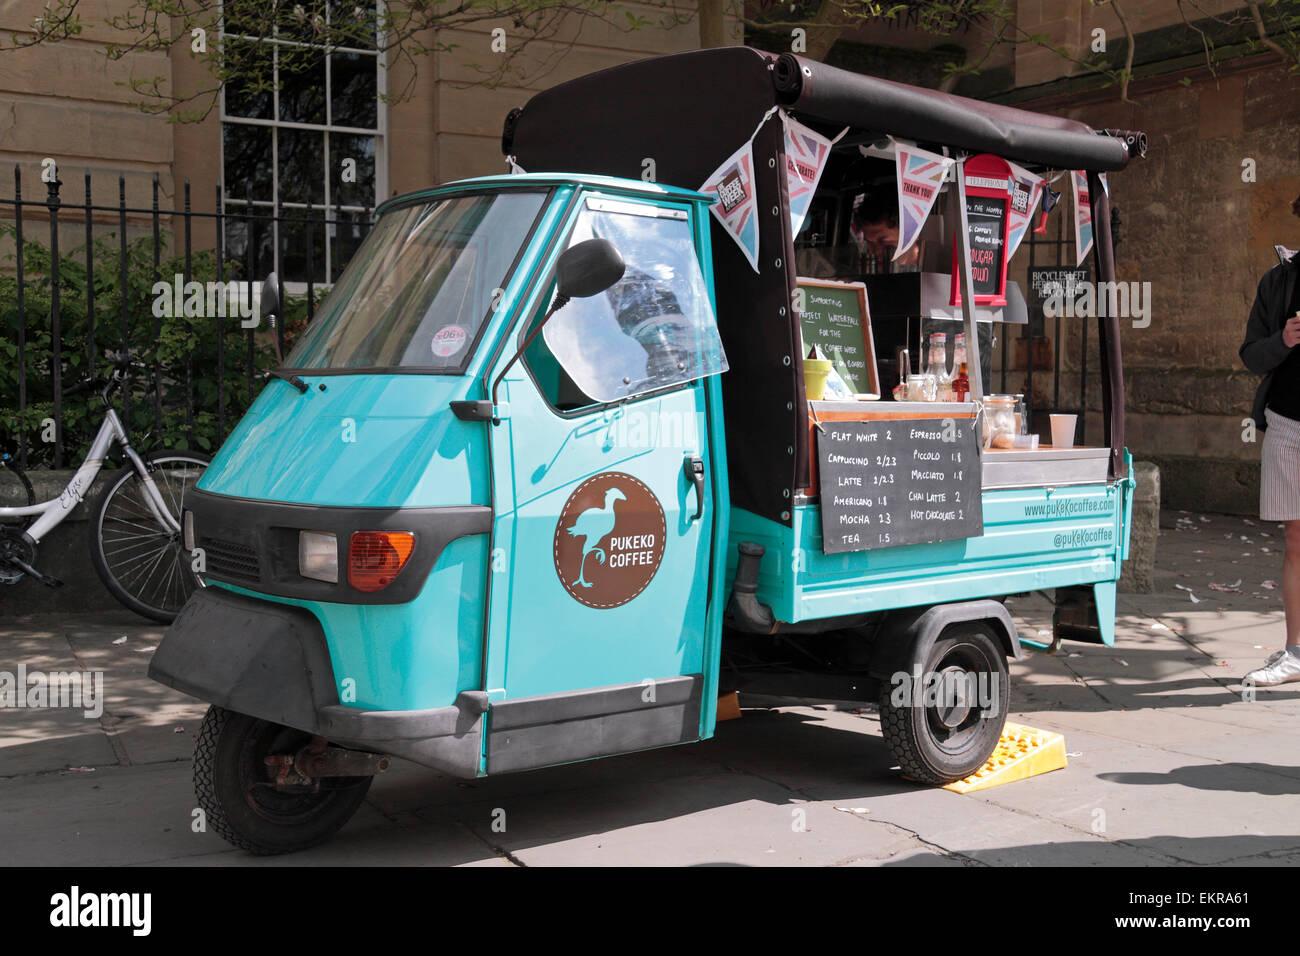 tuktuk stock photos & tuktuk stock images - alamy